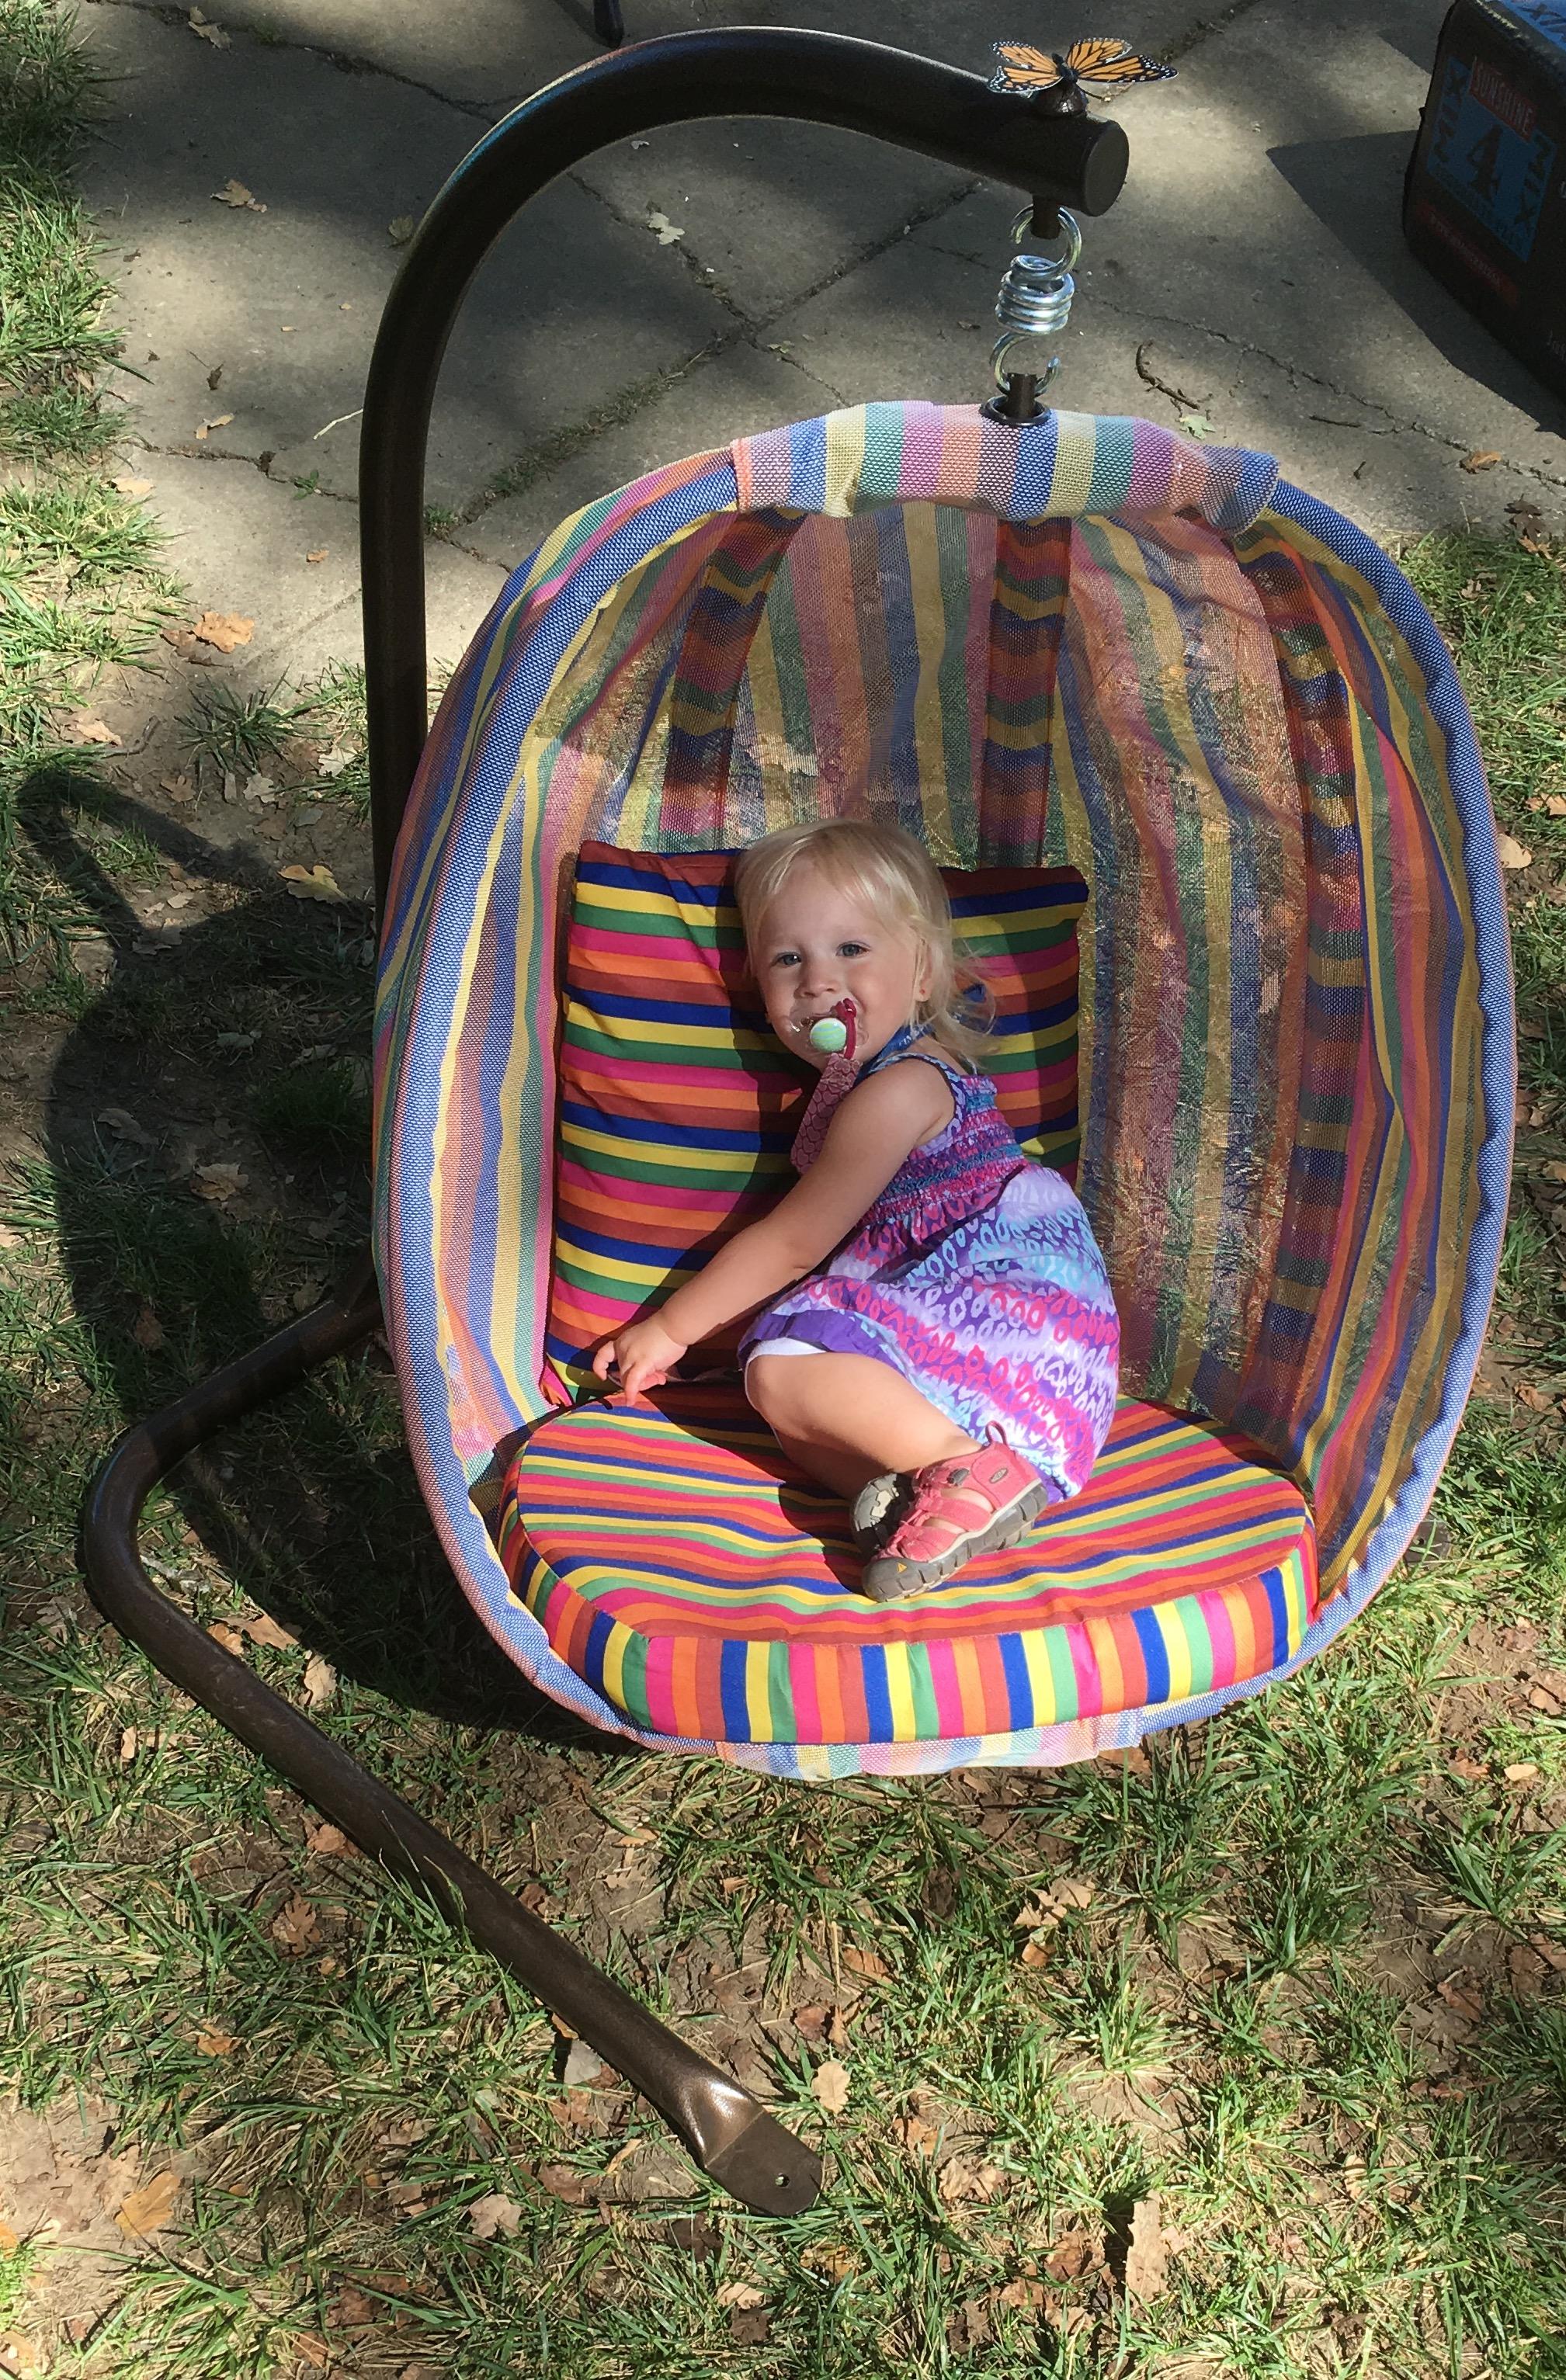 egg-chair-junior-striped-lifestyle-photo-sparetime-trade-show.jpg